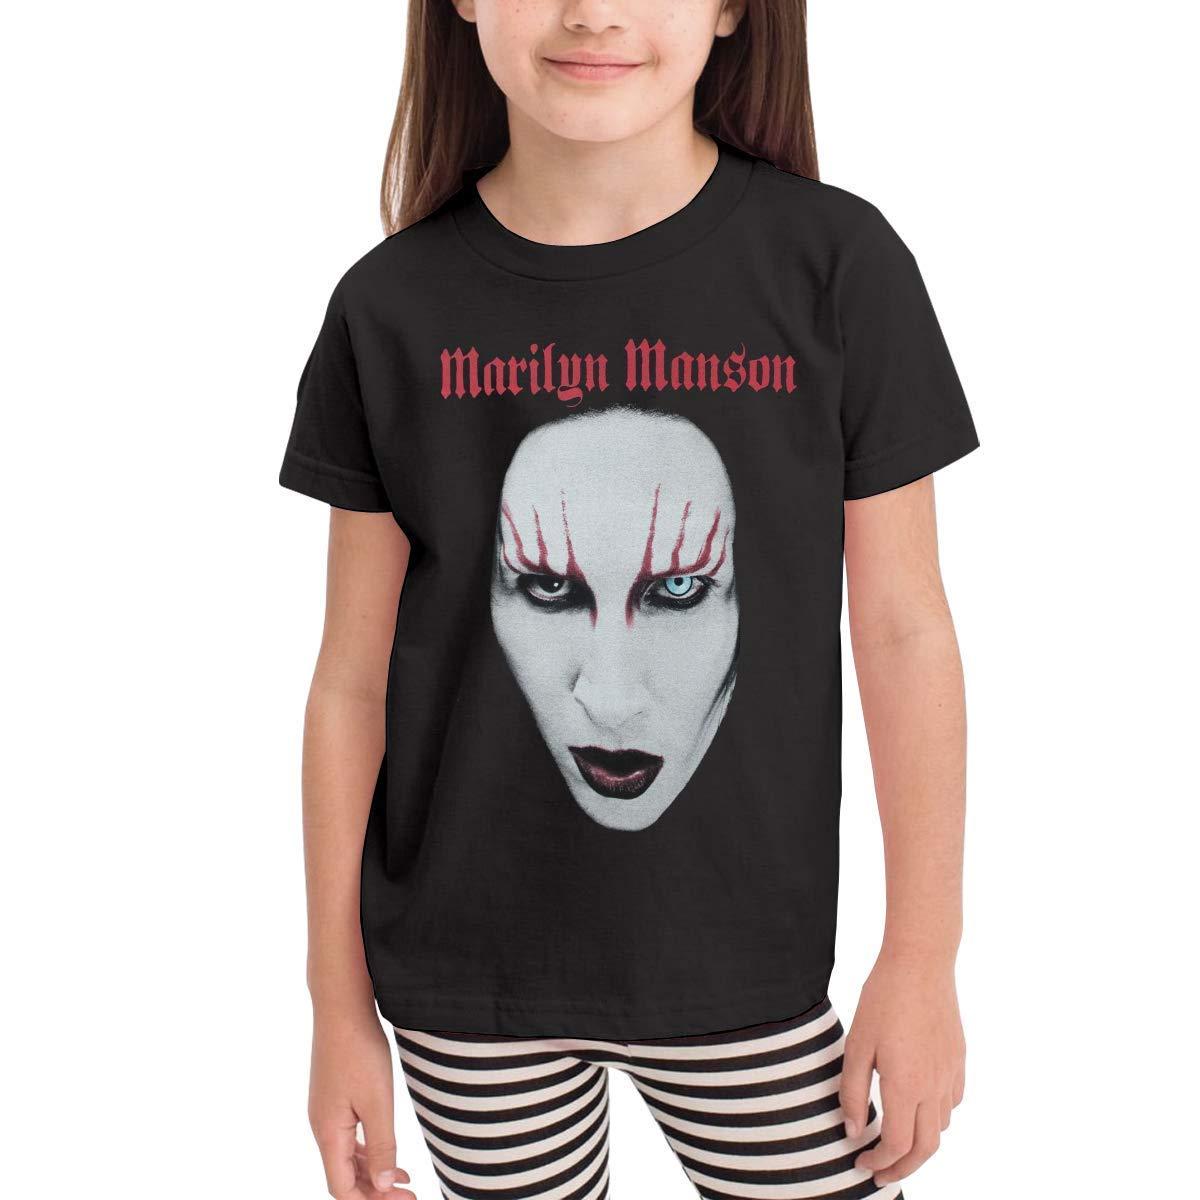 CXHKJ Marilyn Manson Red Lips Childrens Tshirt for Girls /& Boys Black